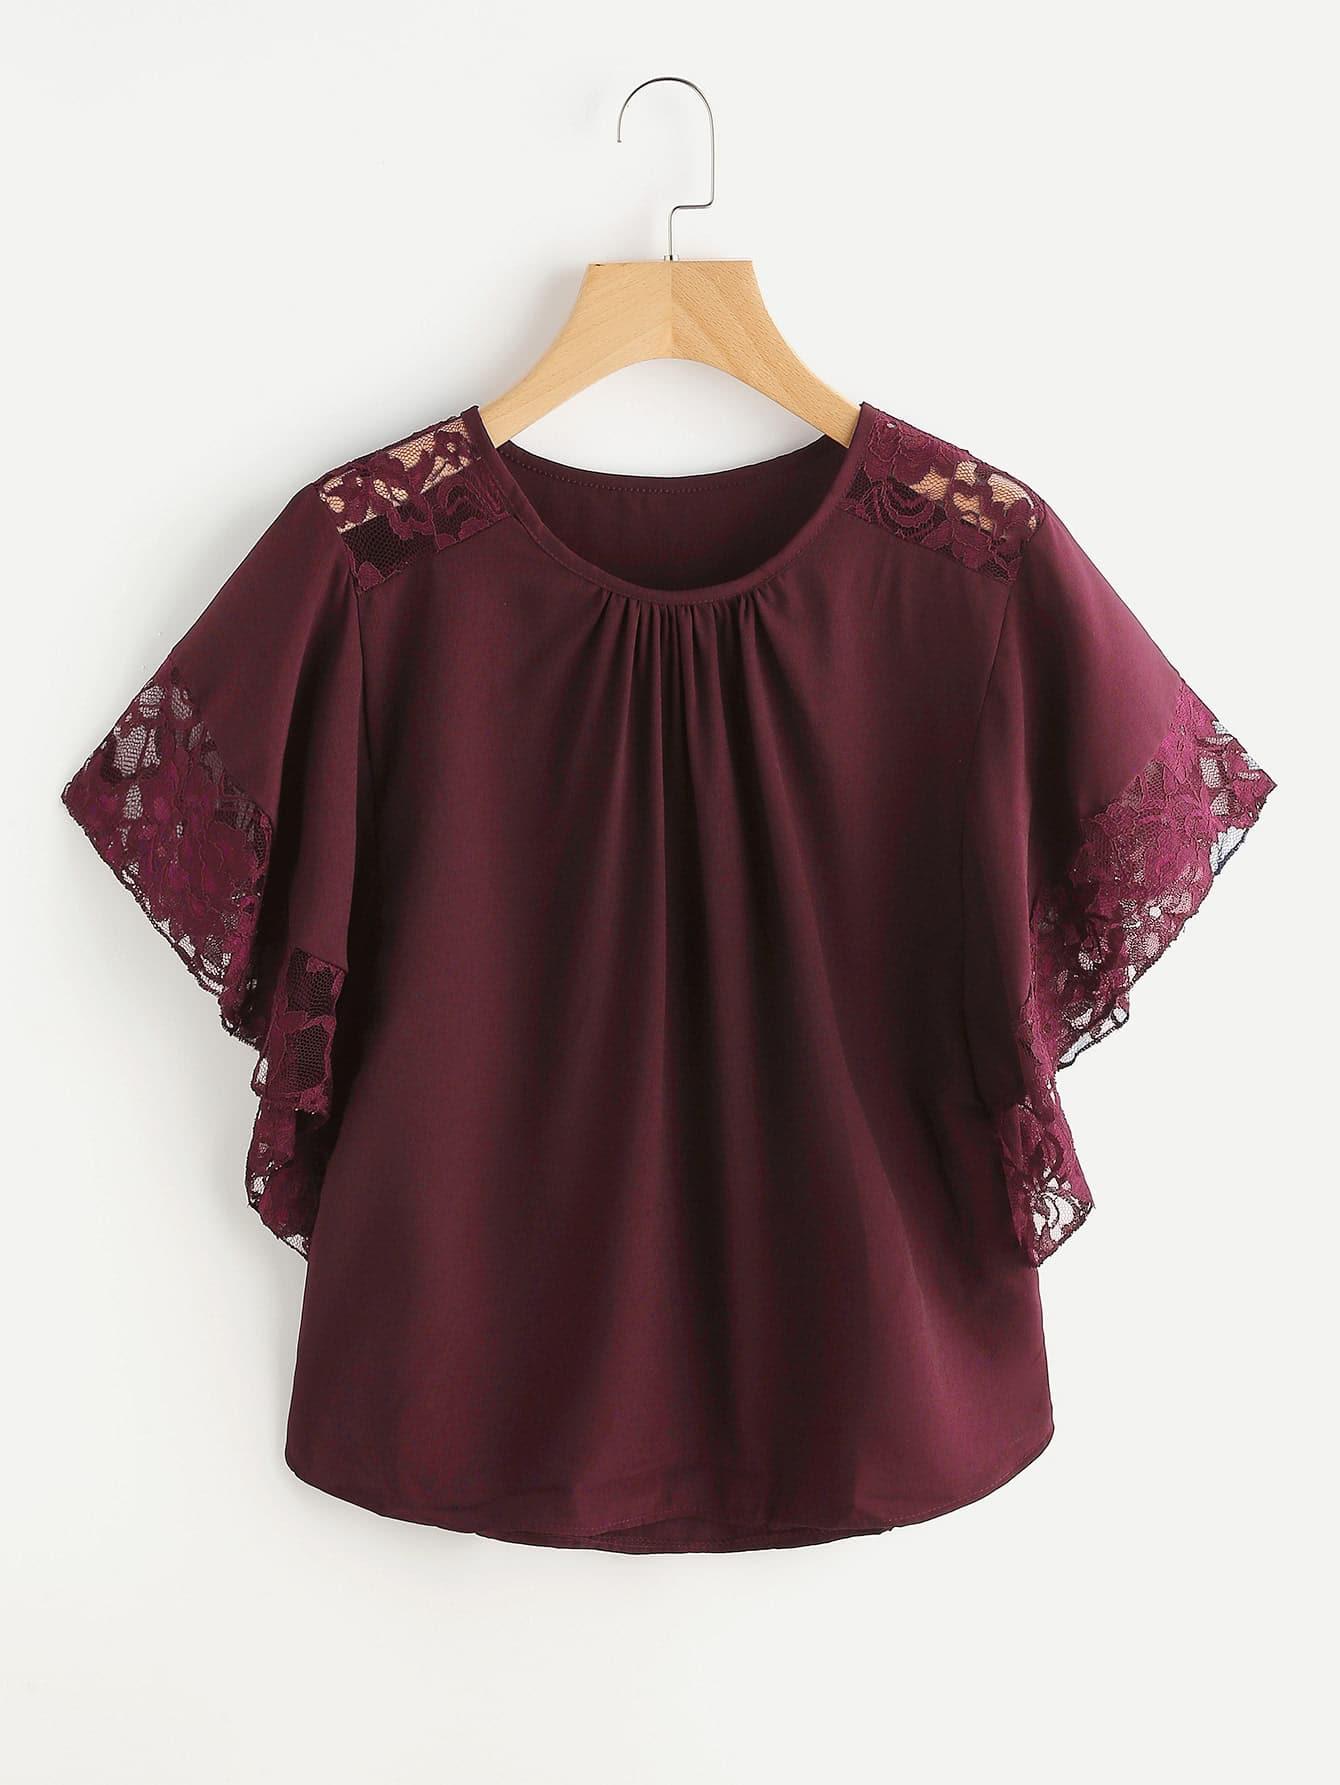 Фото Floral Lace Insert Butterfly Sleeve Blouse. Купить с доставкой